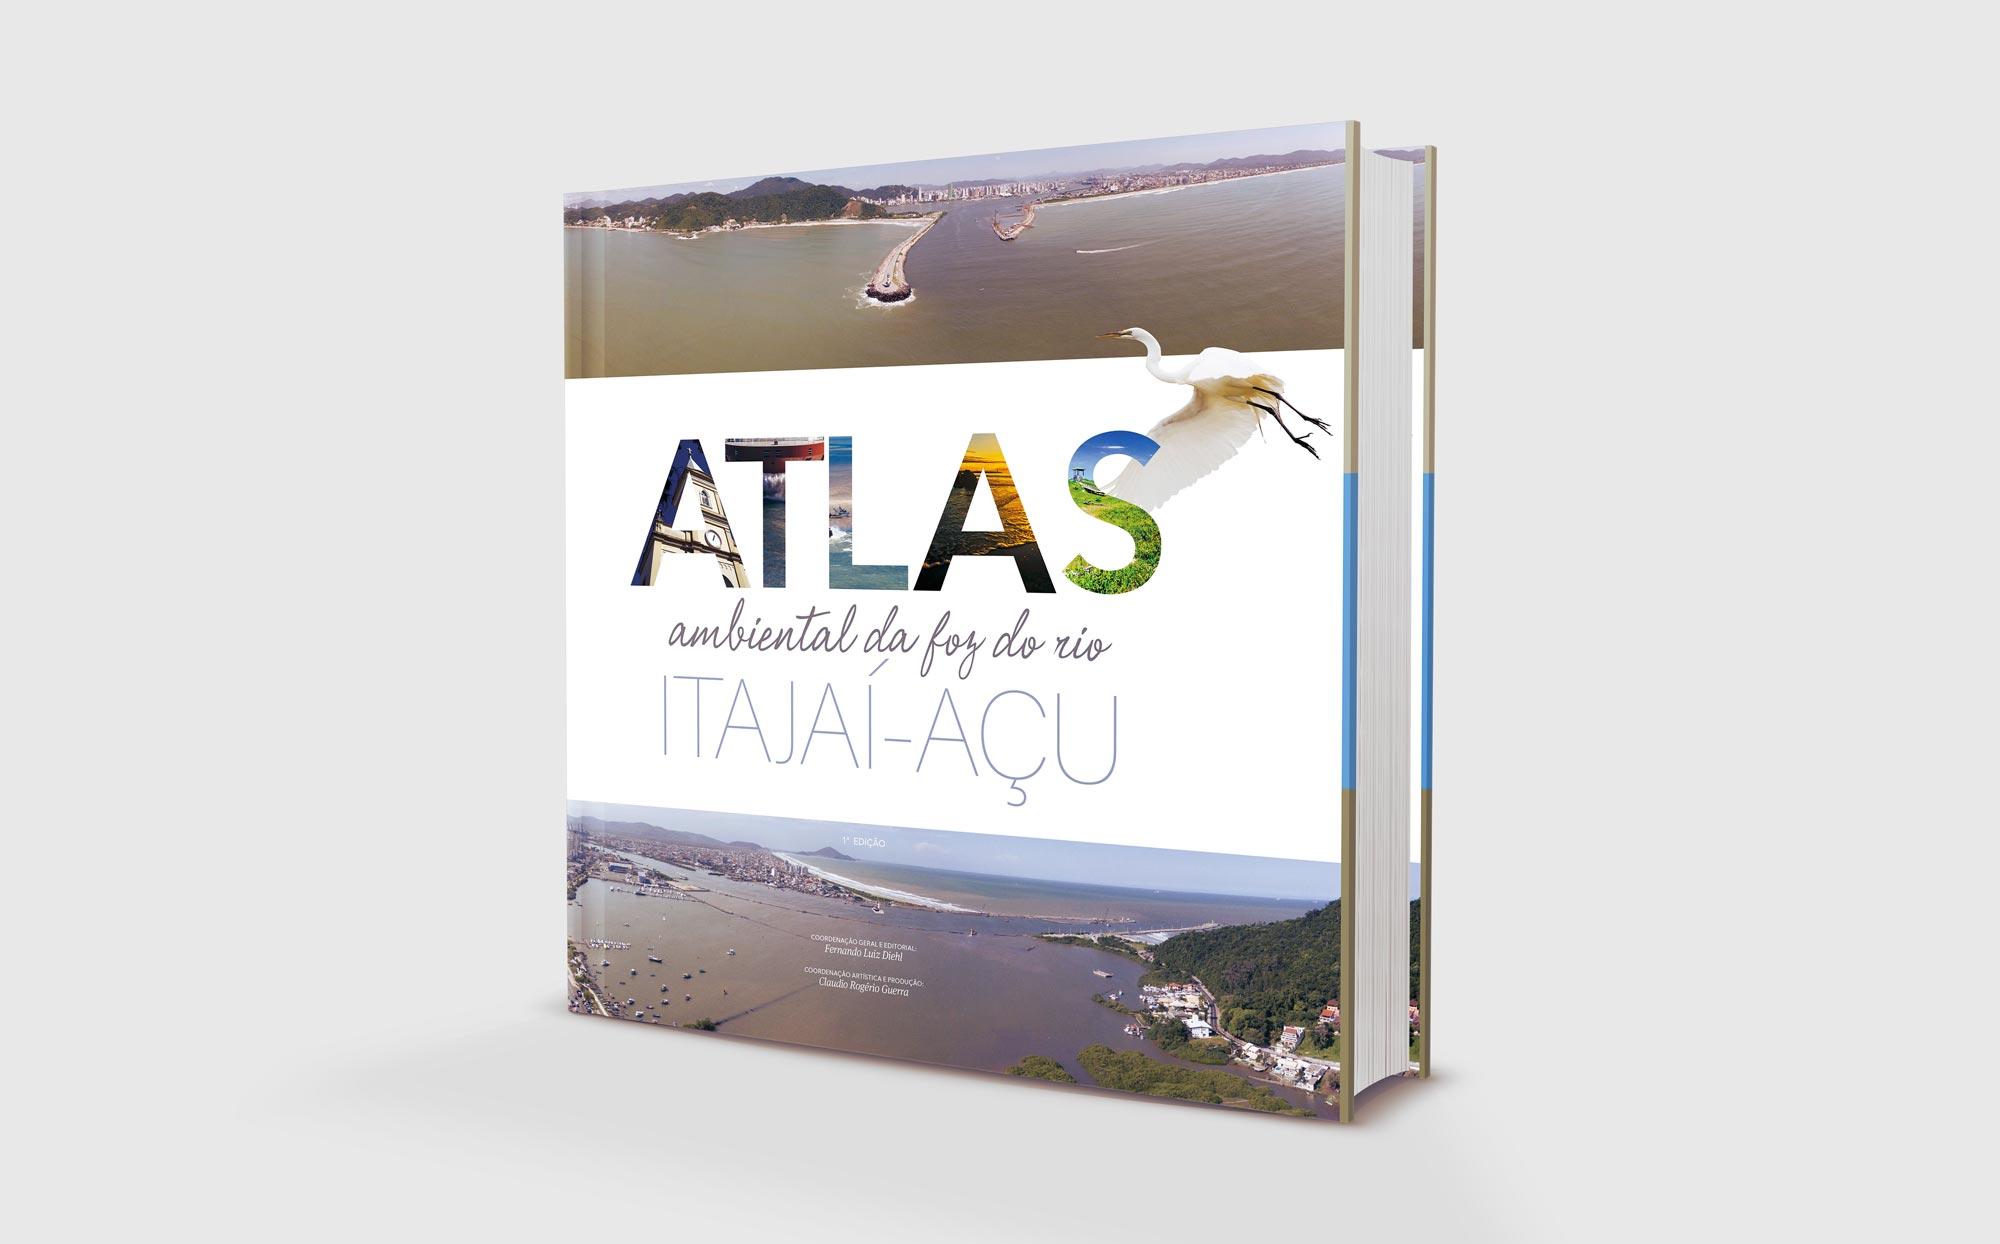 Atlas Ambiental da Foz do Rio Itajaí-Açu